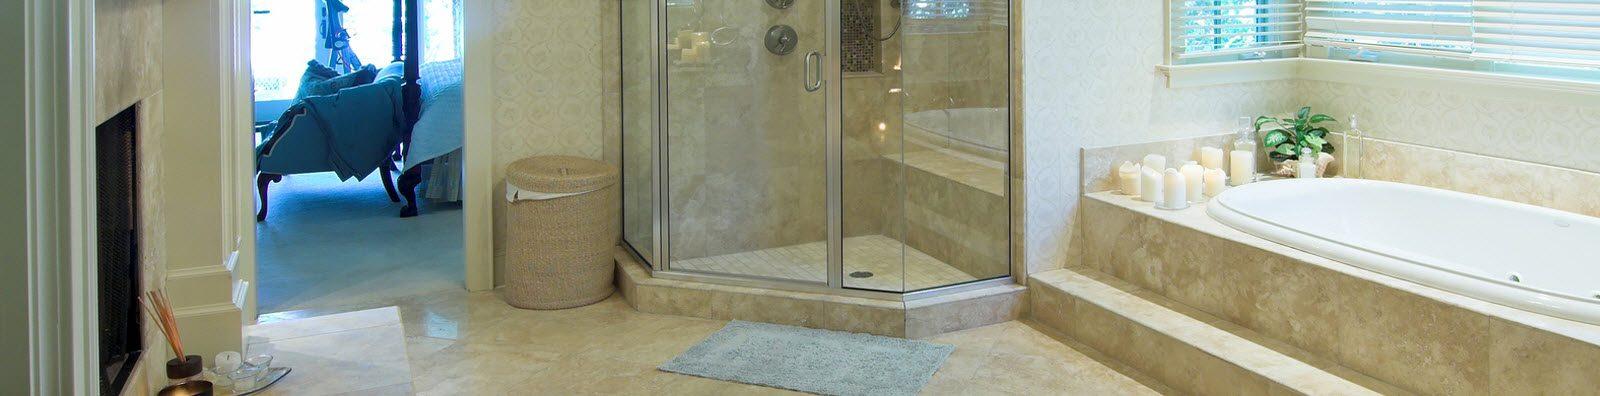 HOME - Randalls Plumbing | Lebanon, MO Residential Master Plumber ...